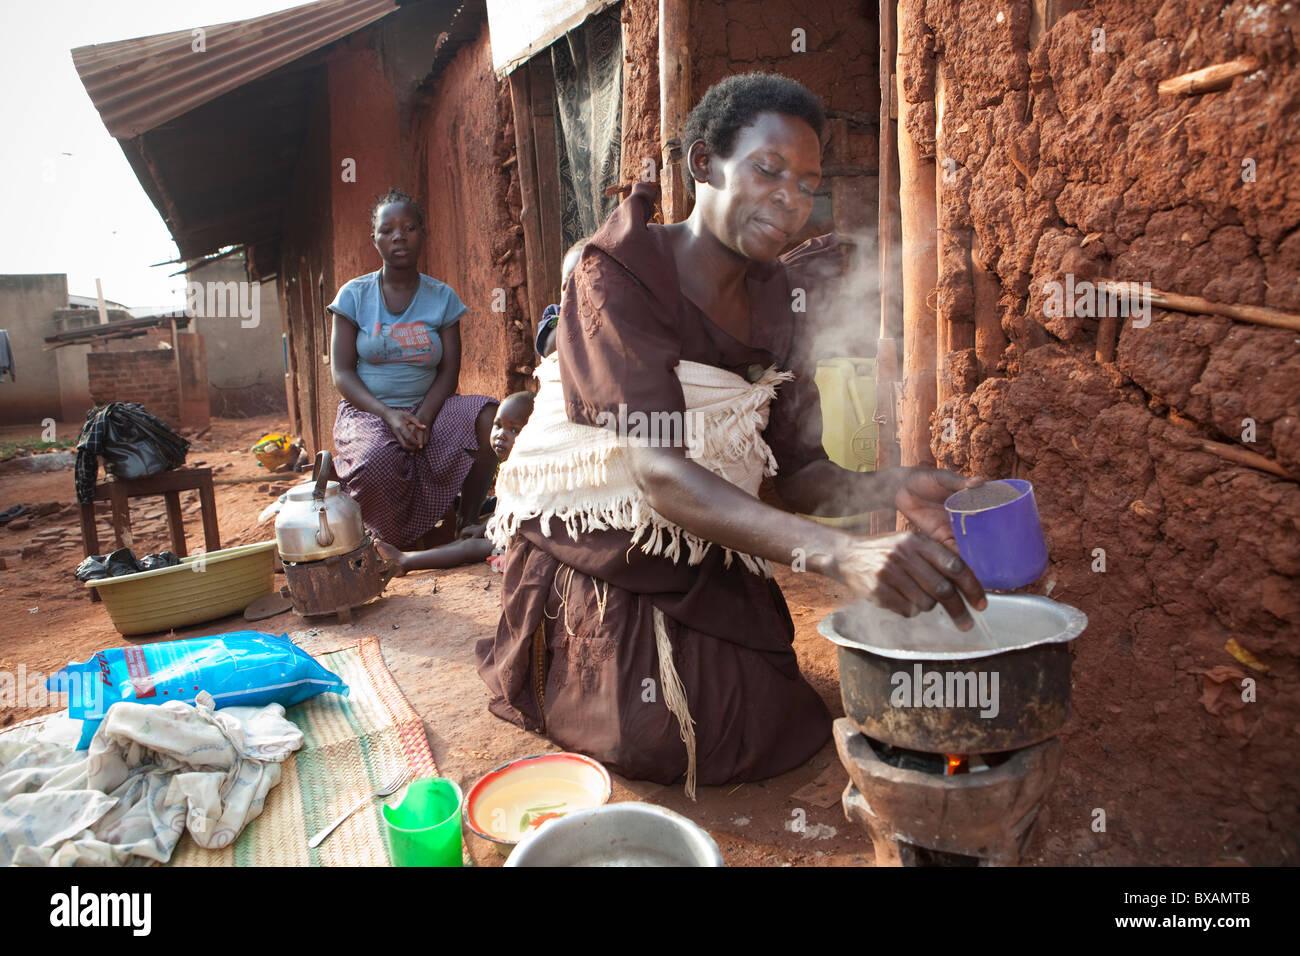 A woman (Ms. Regina Nabirye) cooks outside her small one room house in a slum in Jinja, Uganda, East Africa. - Stock Image